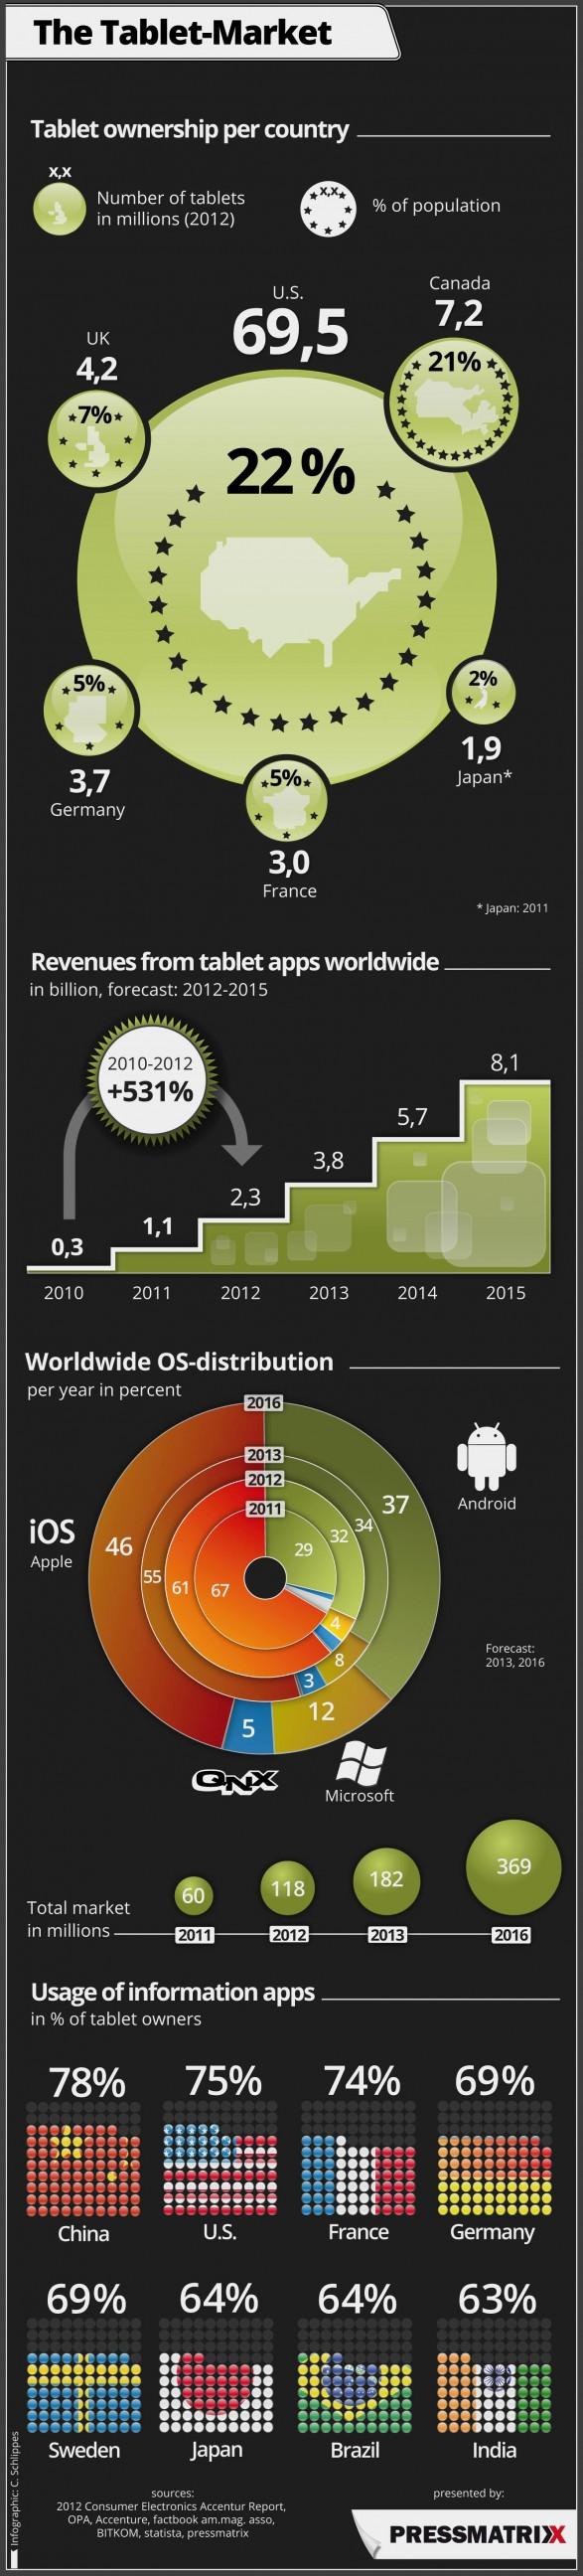 the-tablet-market_506964d3c3b60_w587